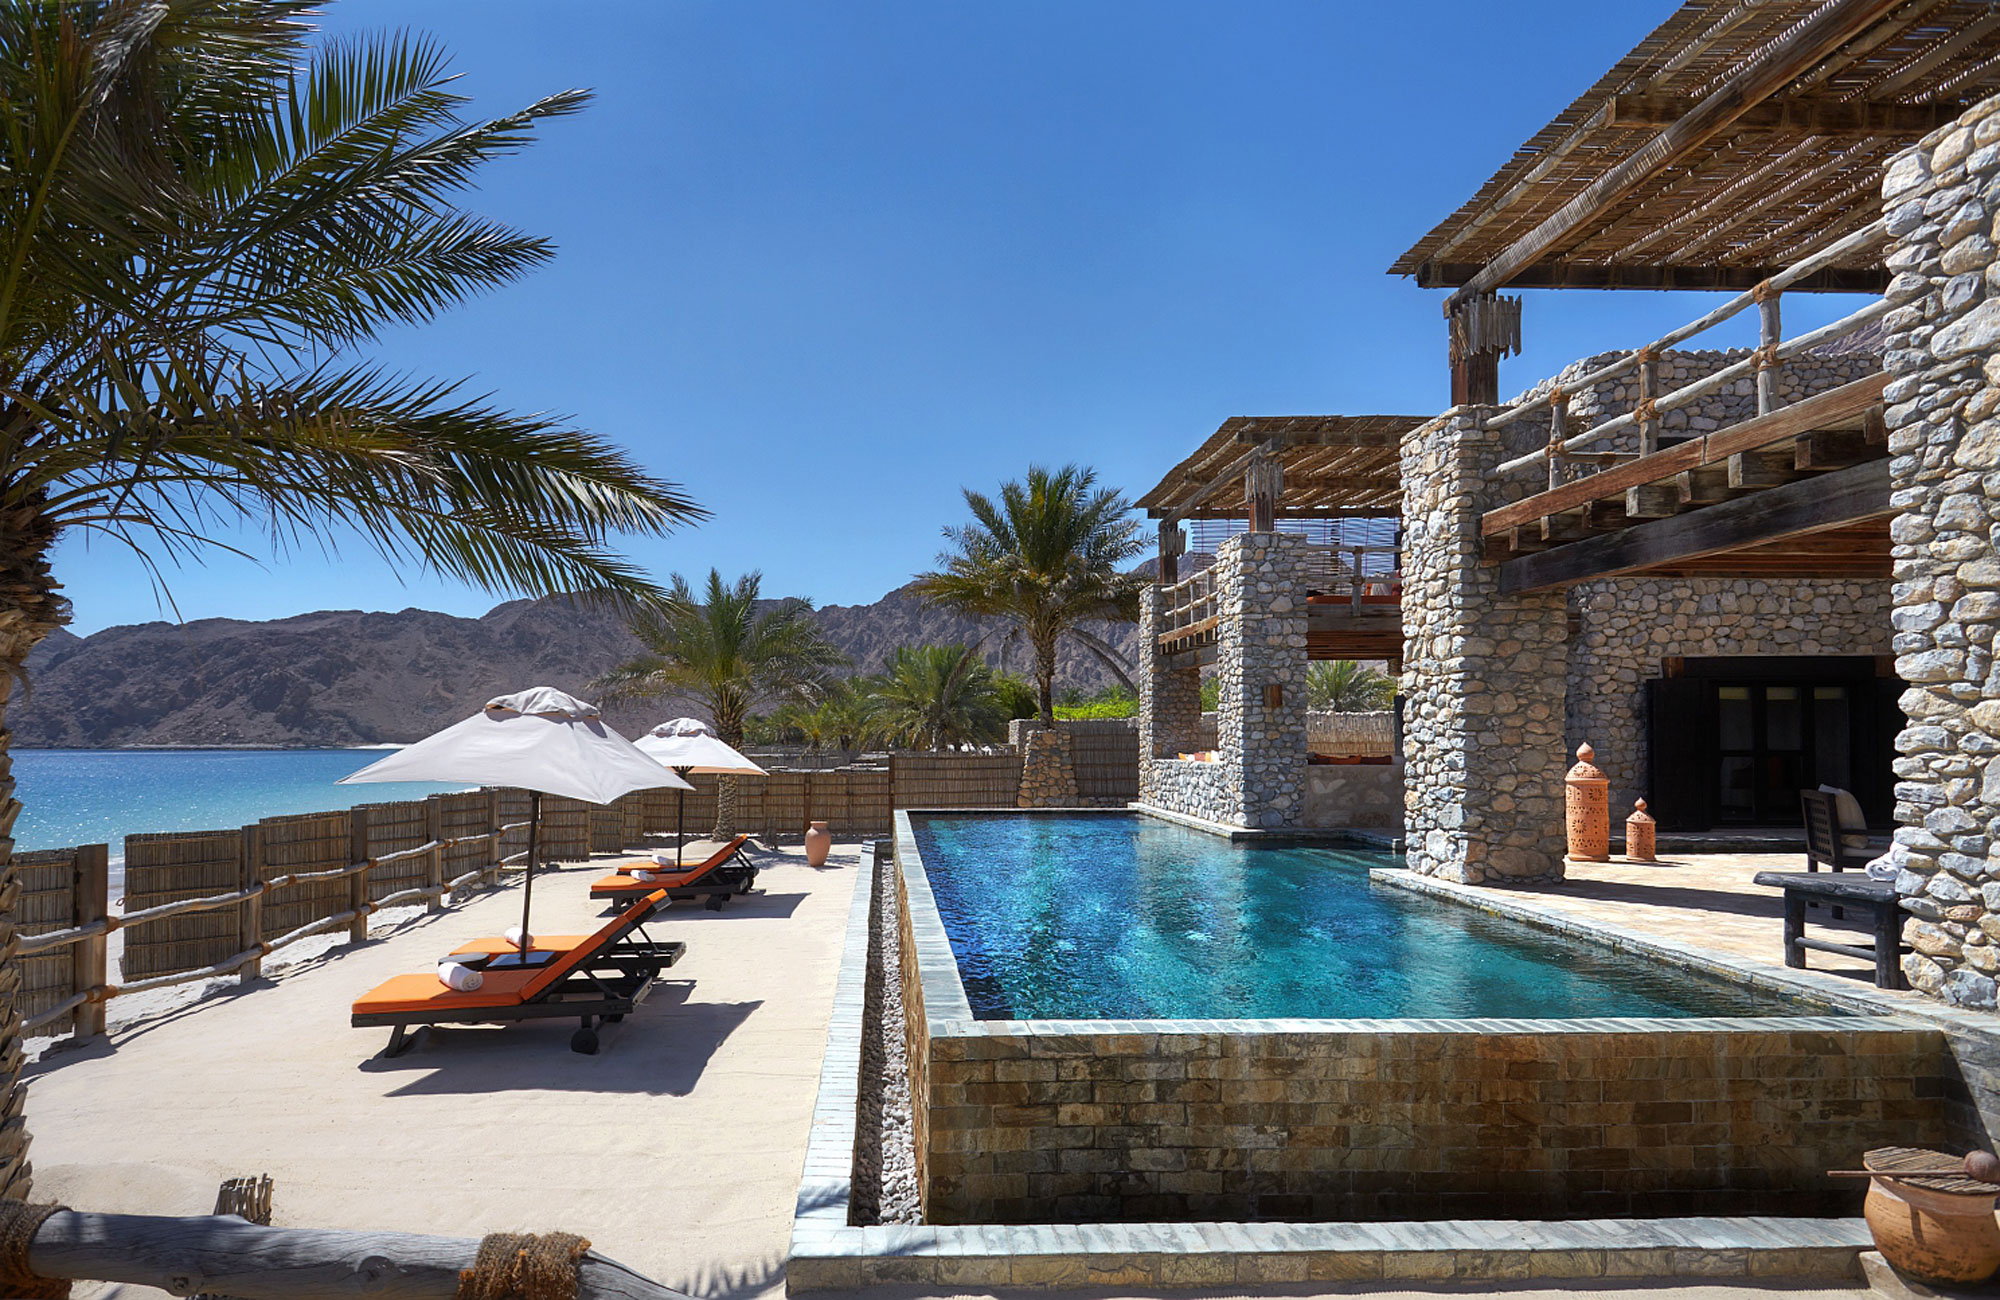 Voyage Oman - Six Senses Zighy Bay - Oman